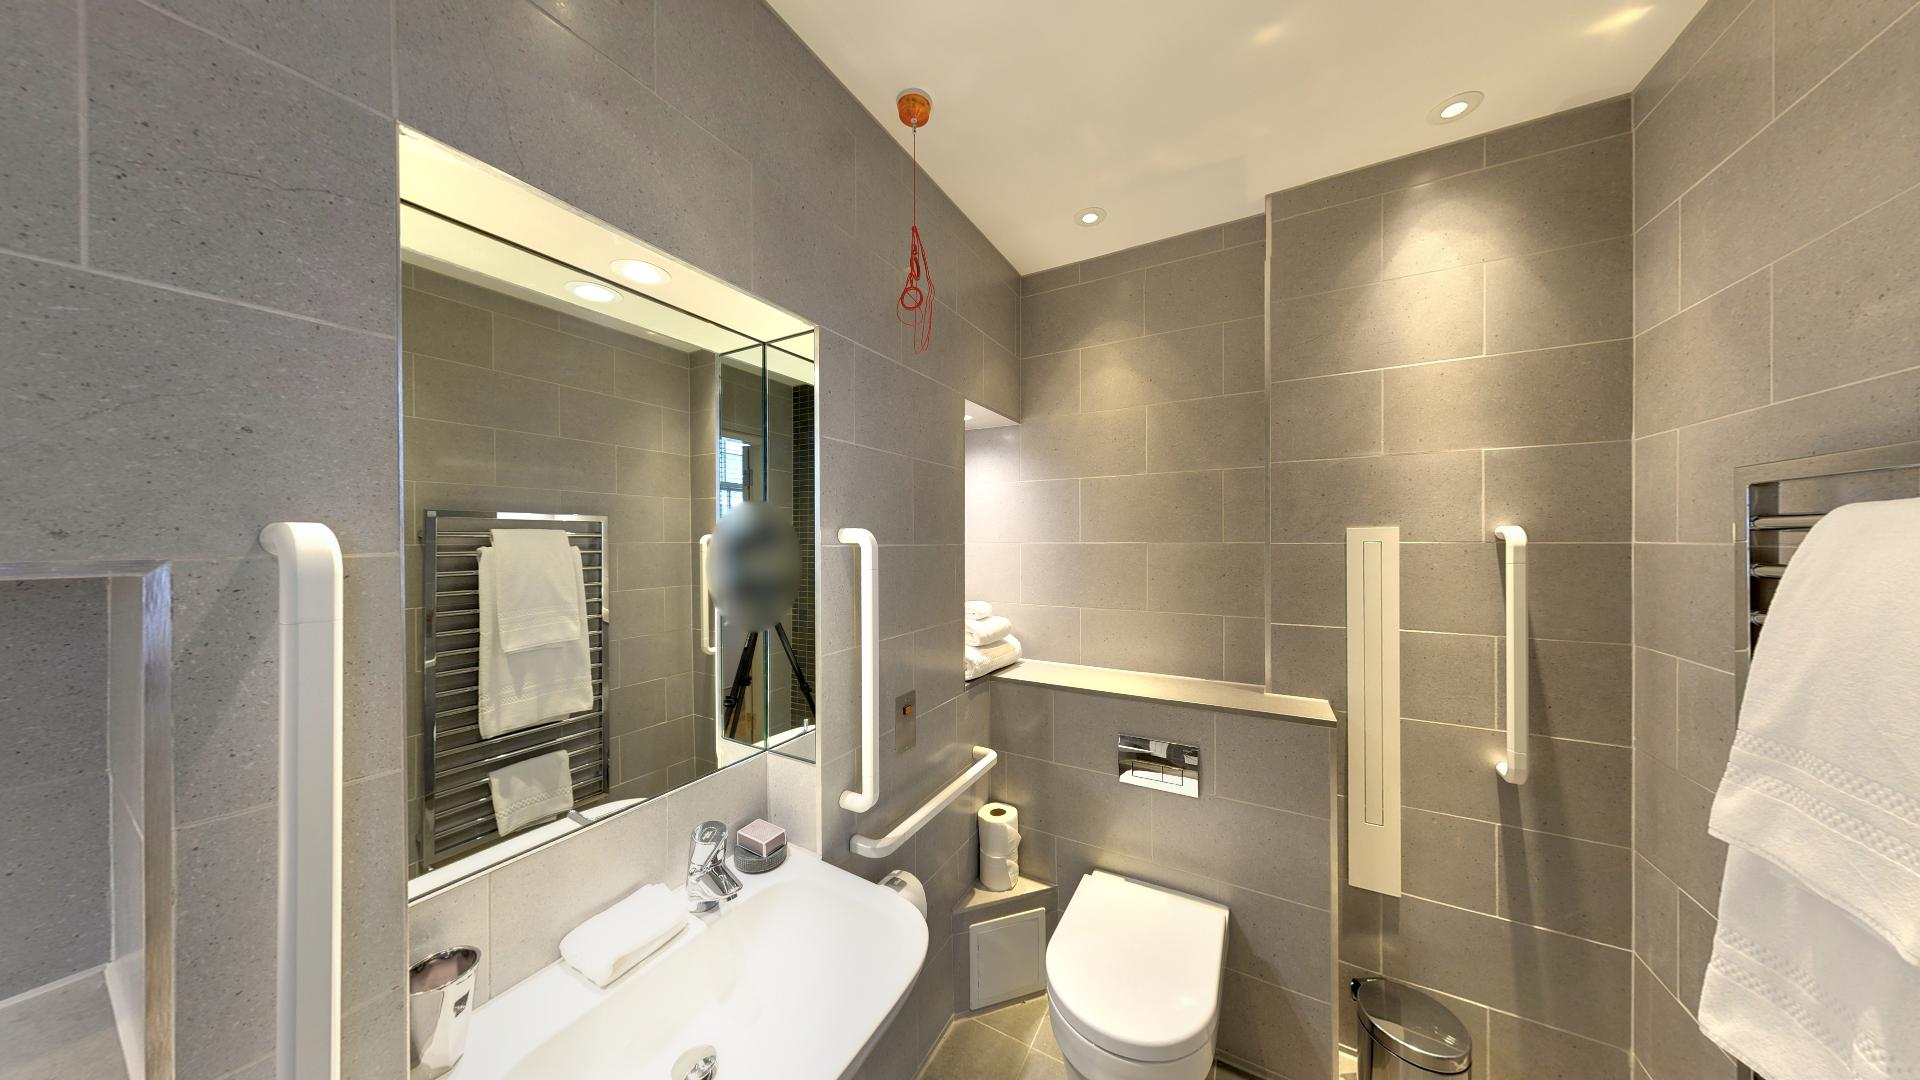 Marylebone Serviced Apartments Central London luxury bathroom Urban Stay